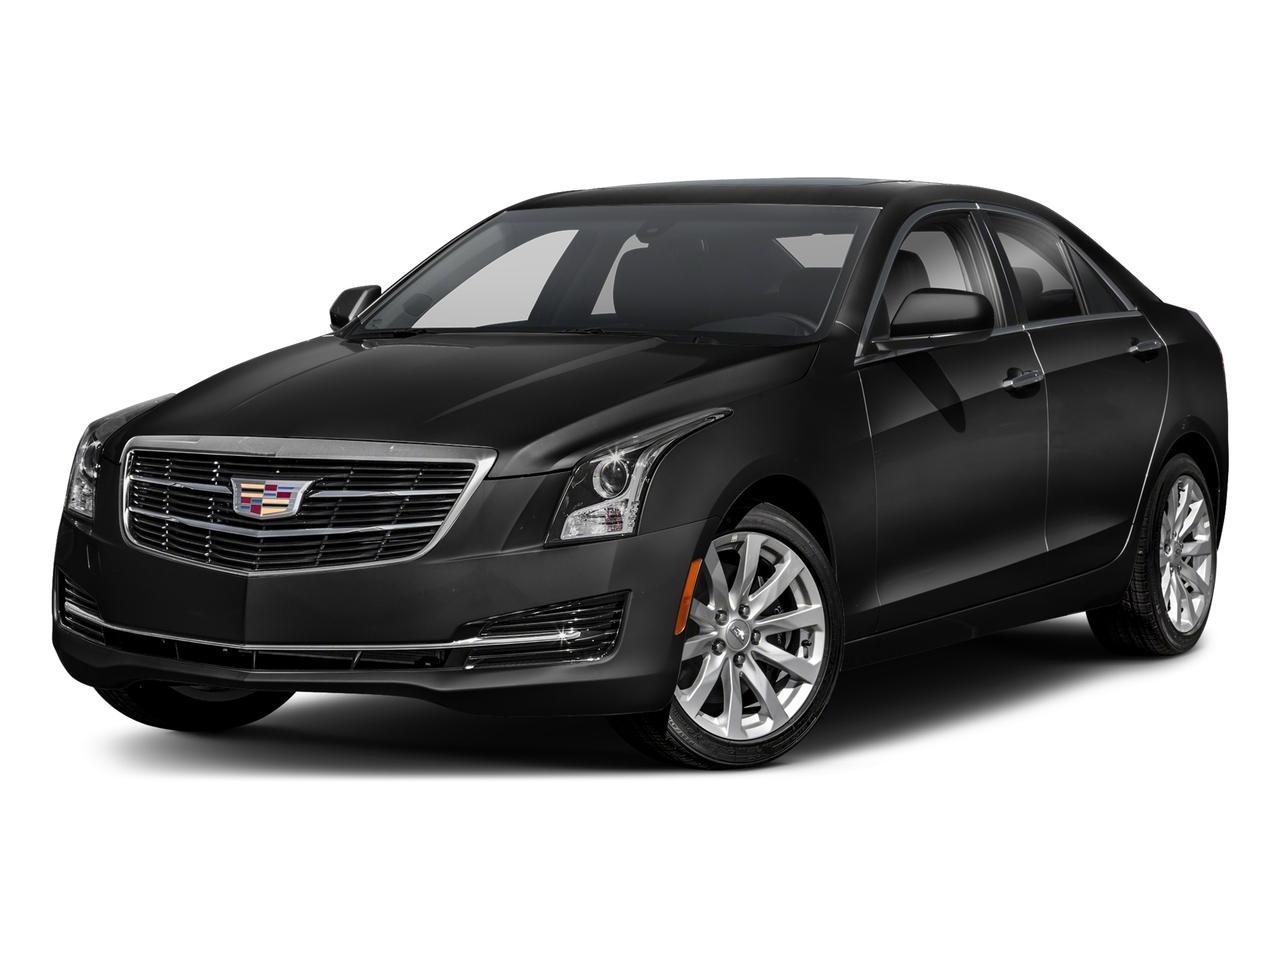 2018 Cadillac ATS Sedan Vehicle Photo in Friendswood, TX 77546